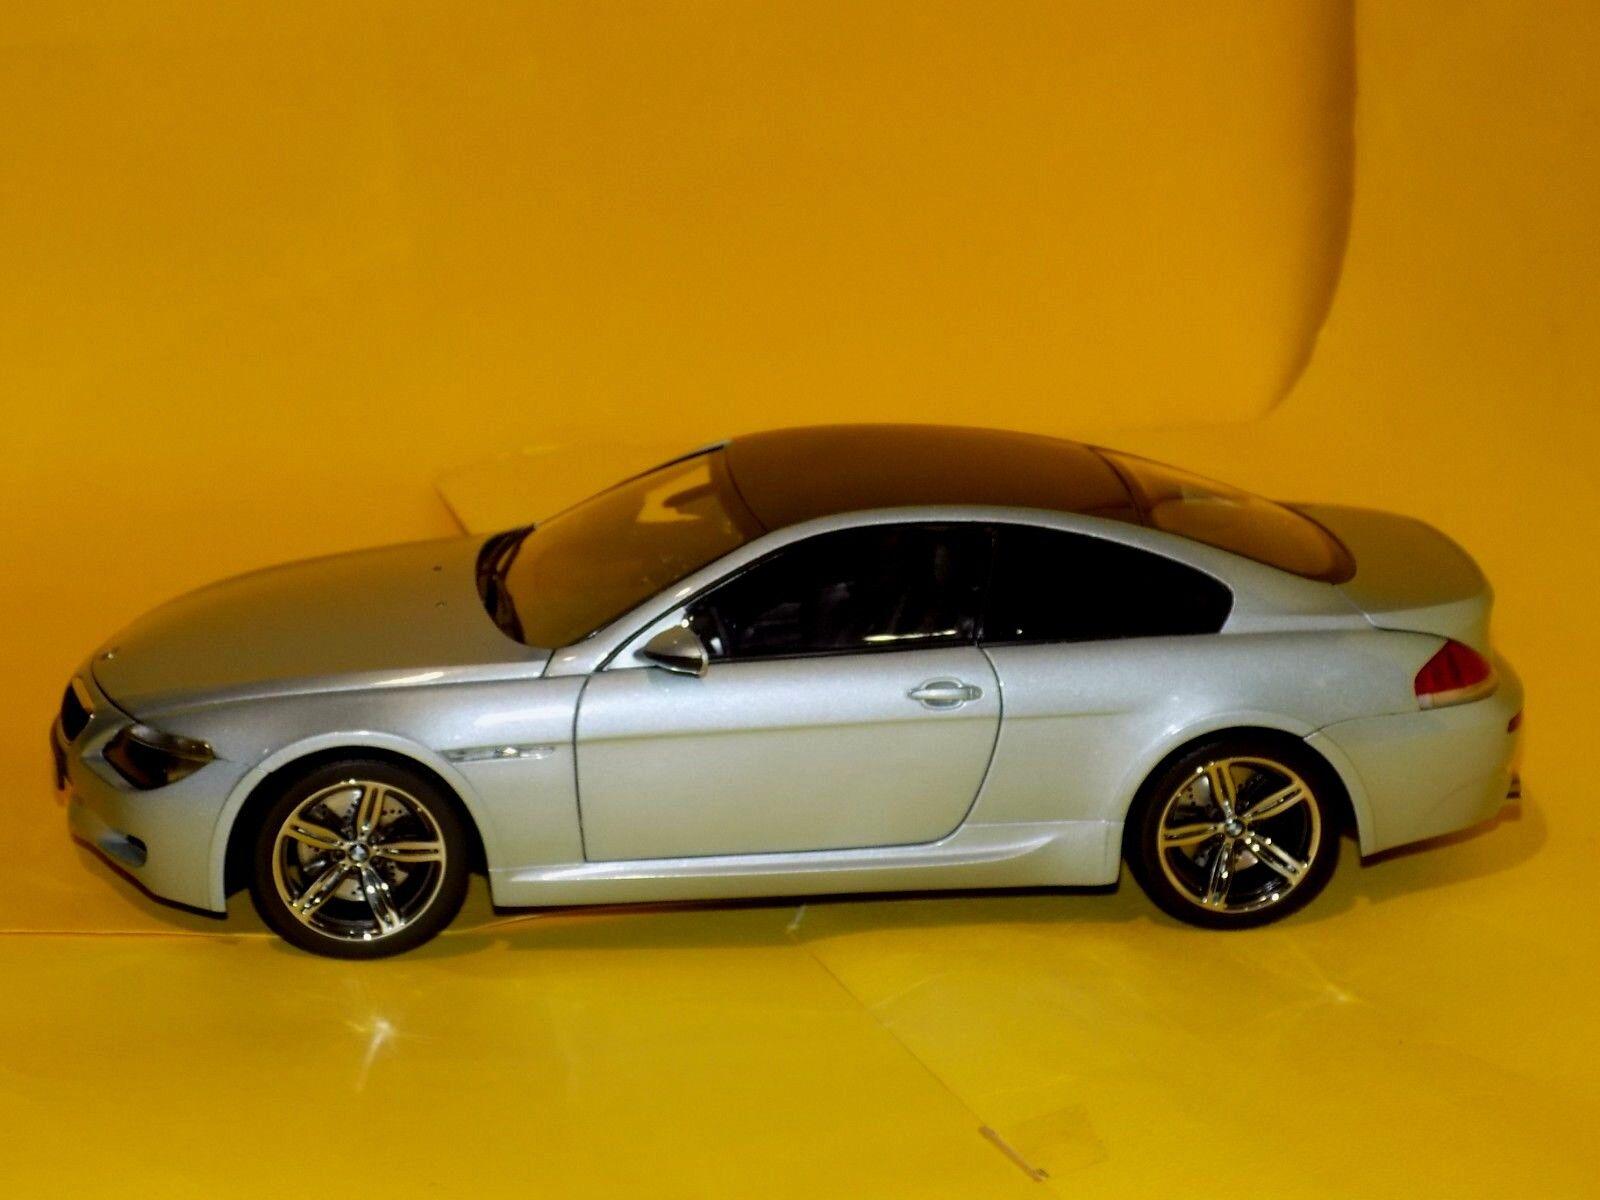 BMW 6 SERIES M6 COUPE E63 2005 KYOSHO 08703S 1:18